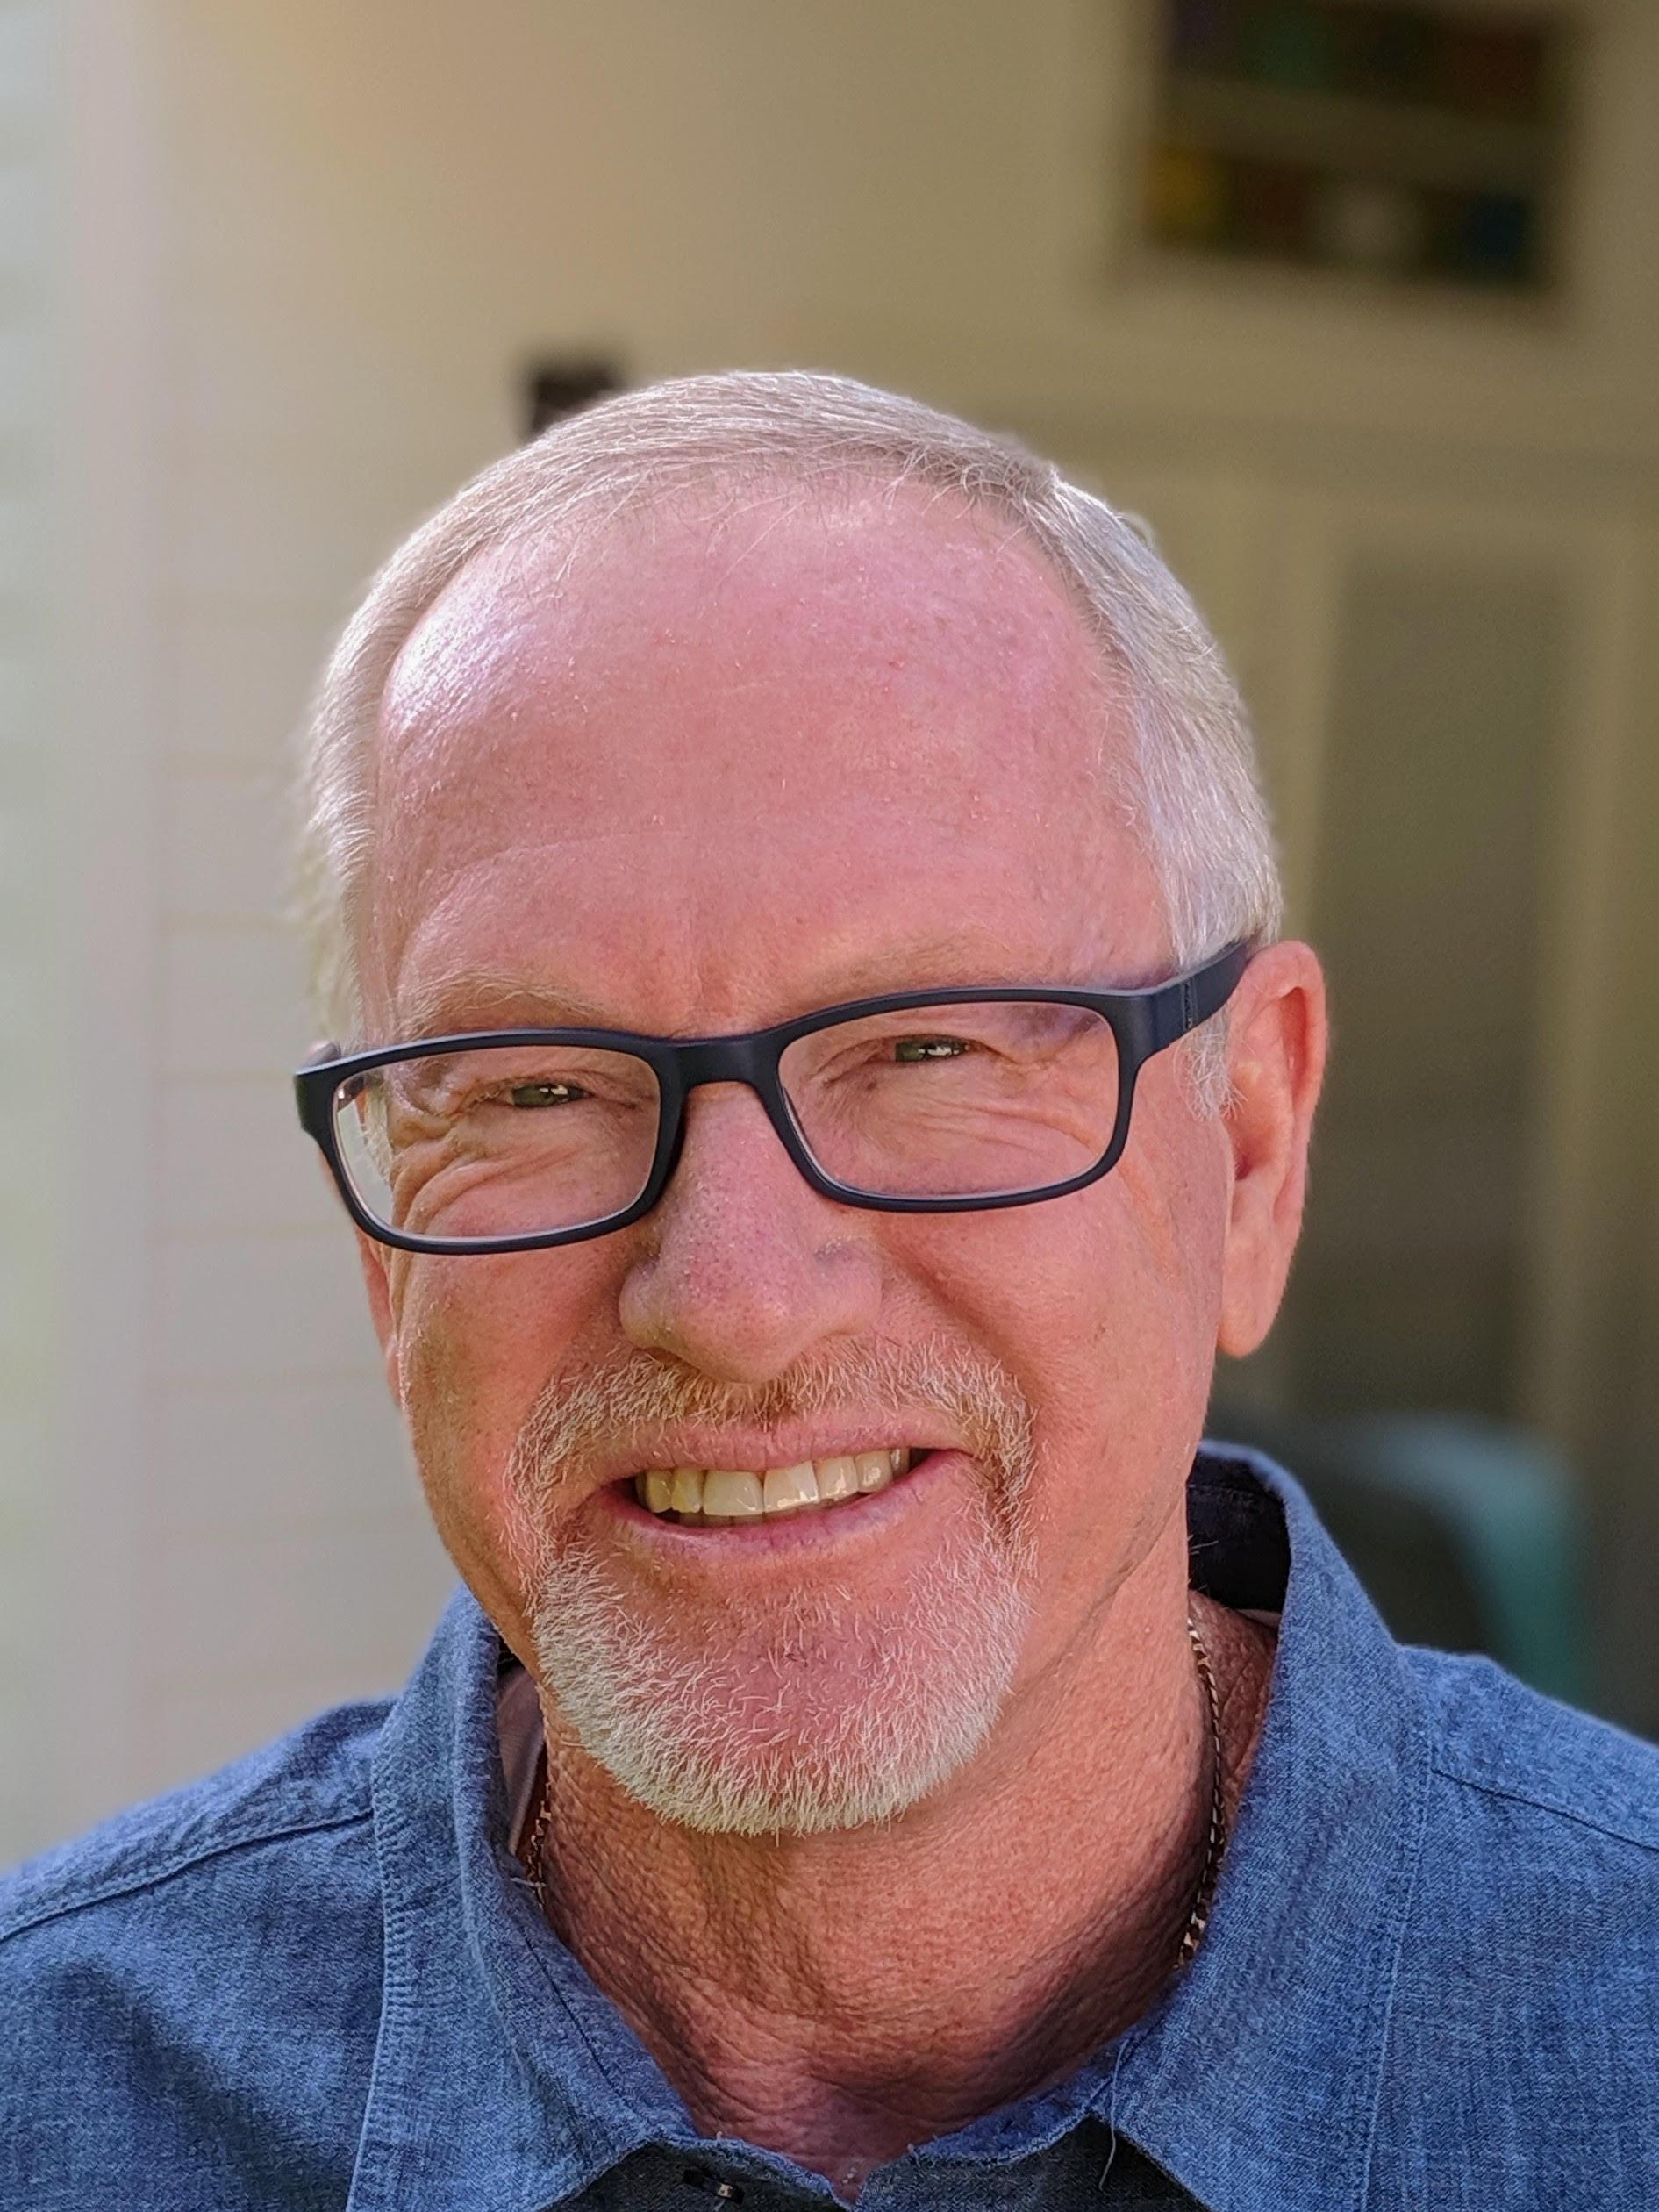 Kevin Condon - Atlanta Counselor - Male